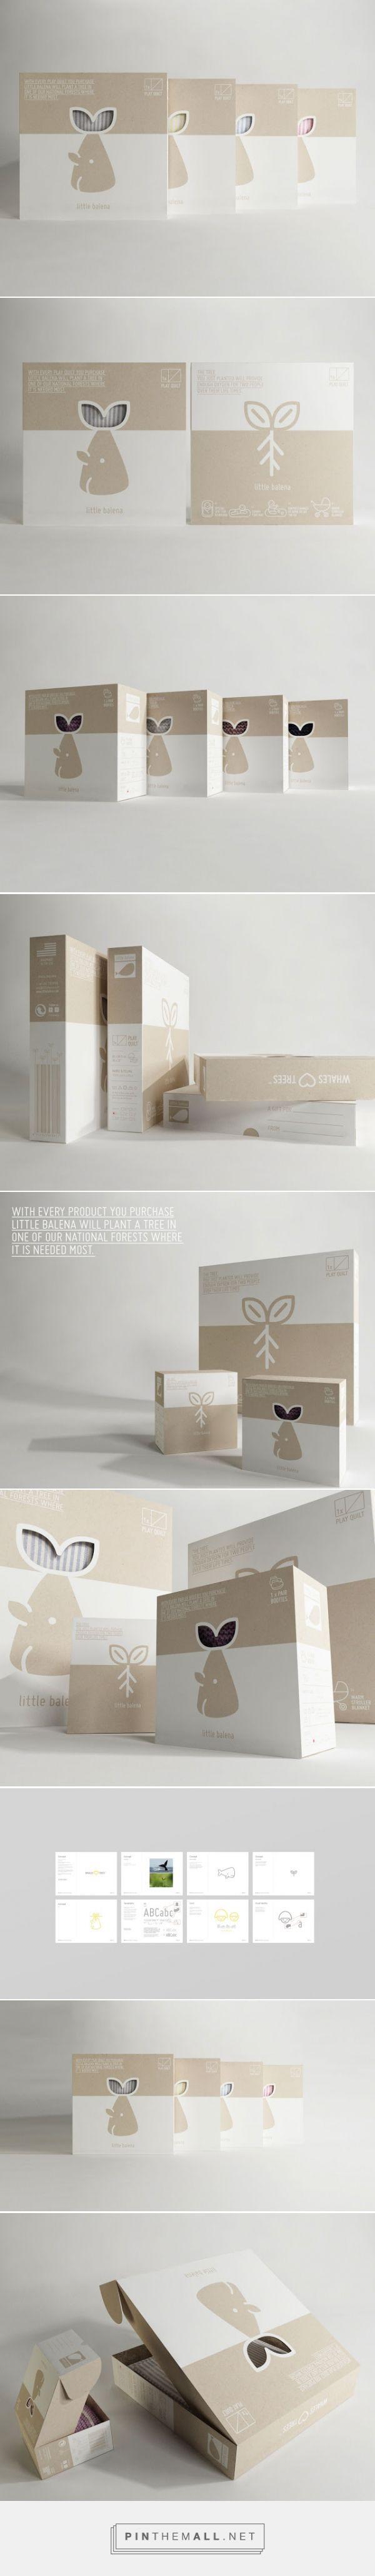 Little Balena - Packaging of the World - Creative Package Design Gallery - http://www.packagingoftheworld.com/2016/02/little-balena.html